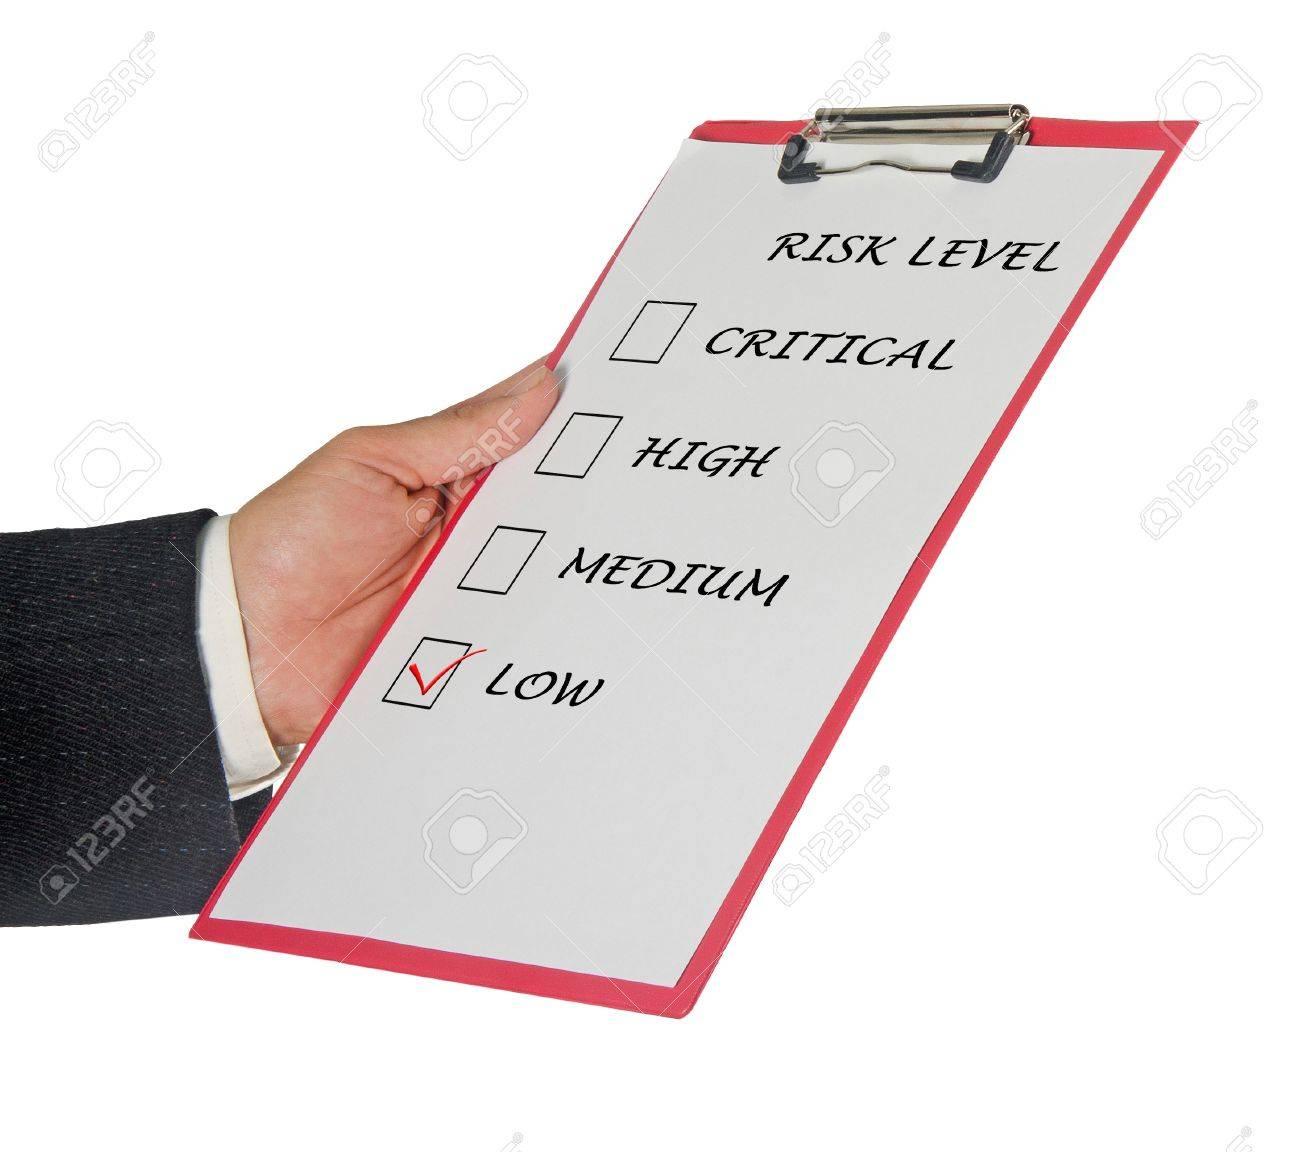 Checklist for risk level Stock Photo - 11404638